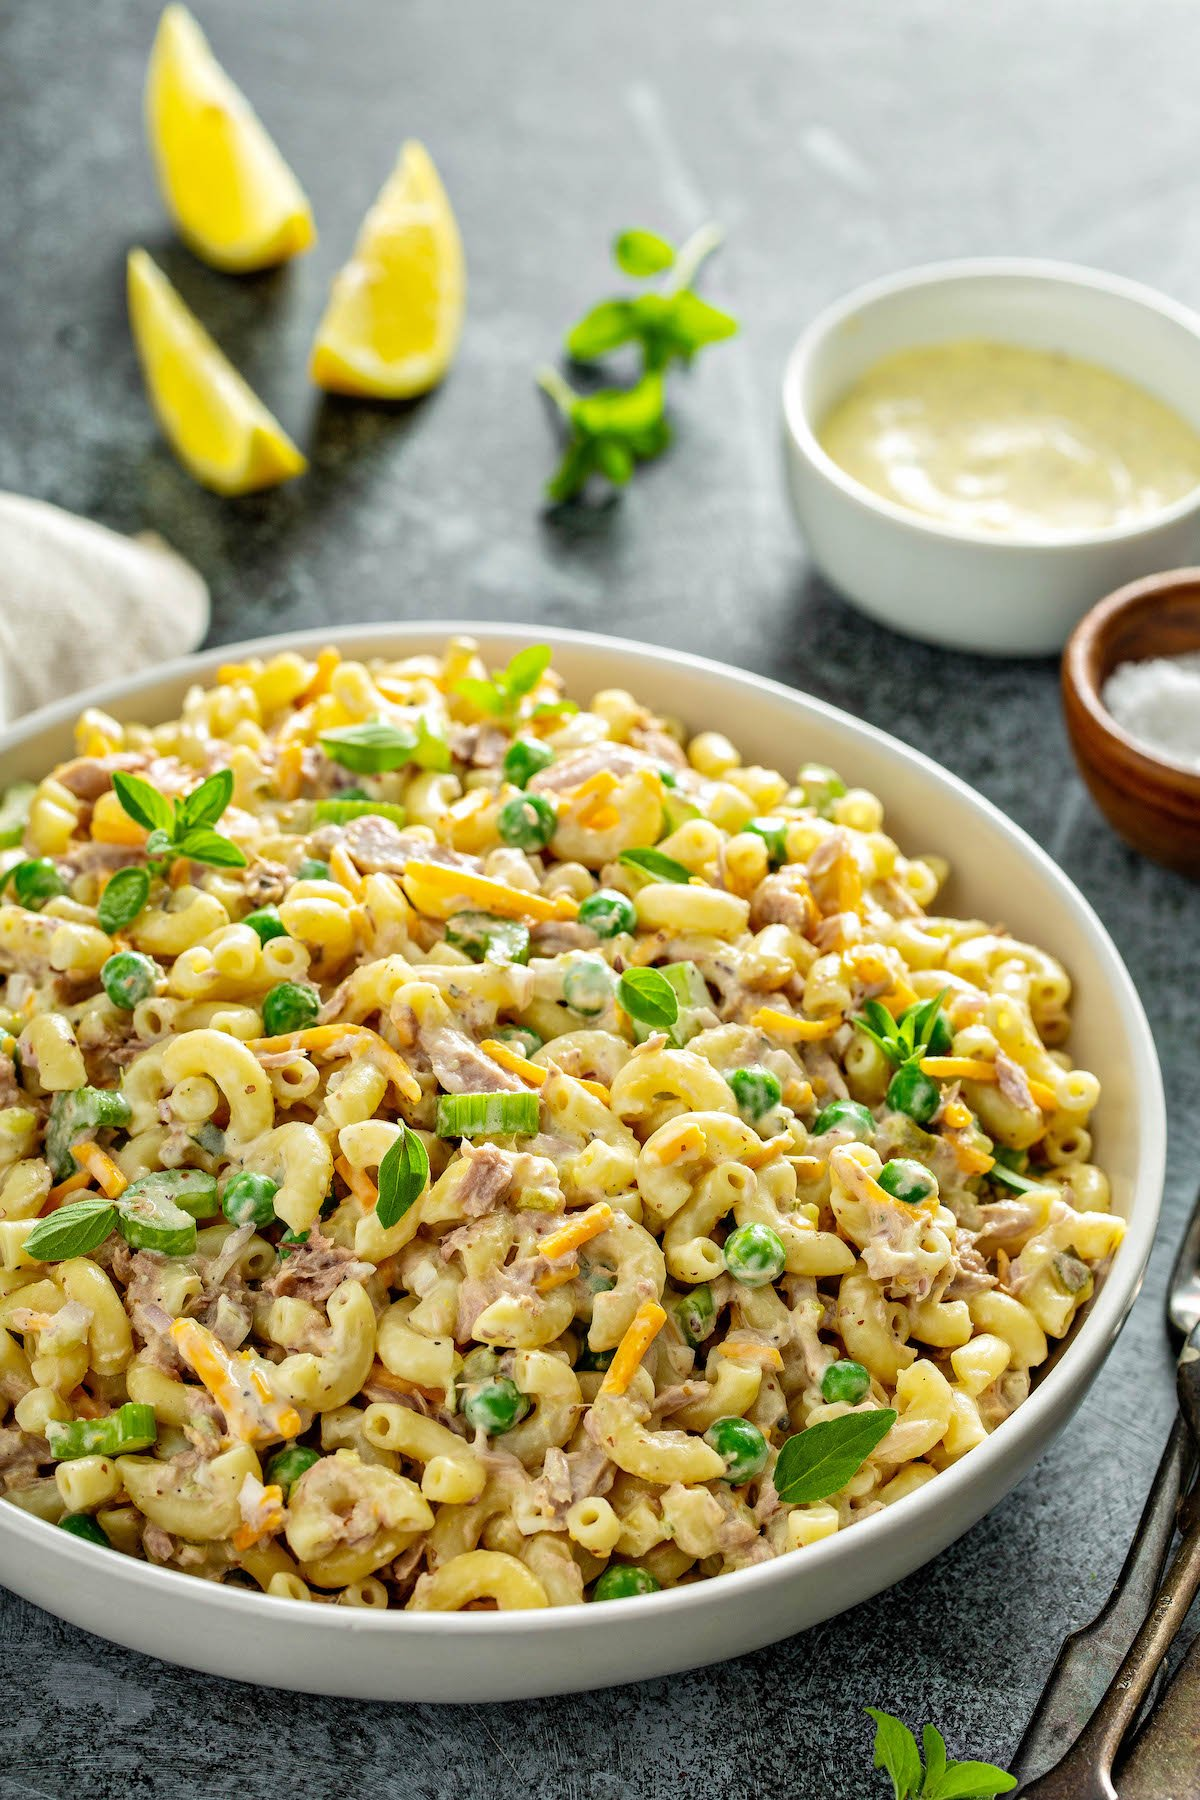 Tuna pasta salad with peas and macaroni.